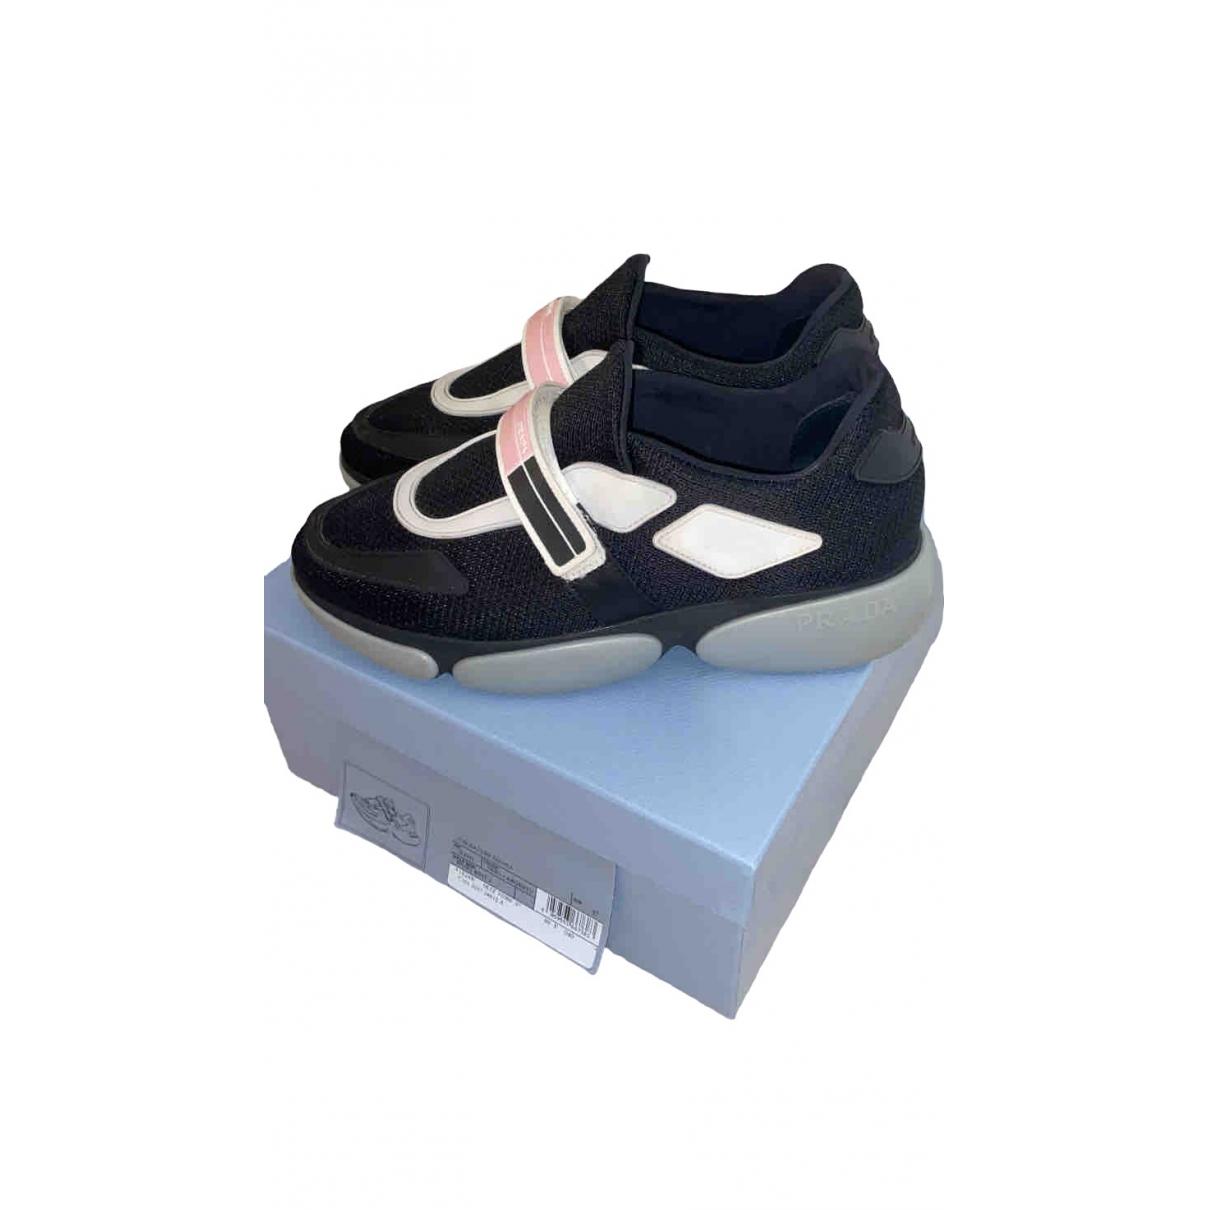 Prada Cloudbust Black Cloth Trainers for Women 37 EU